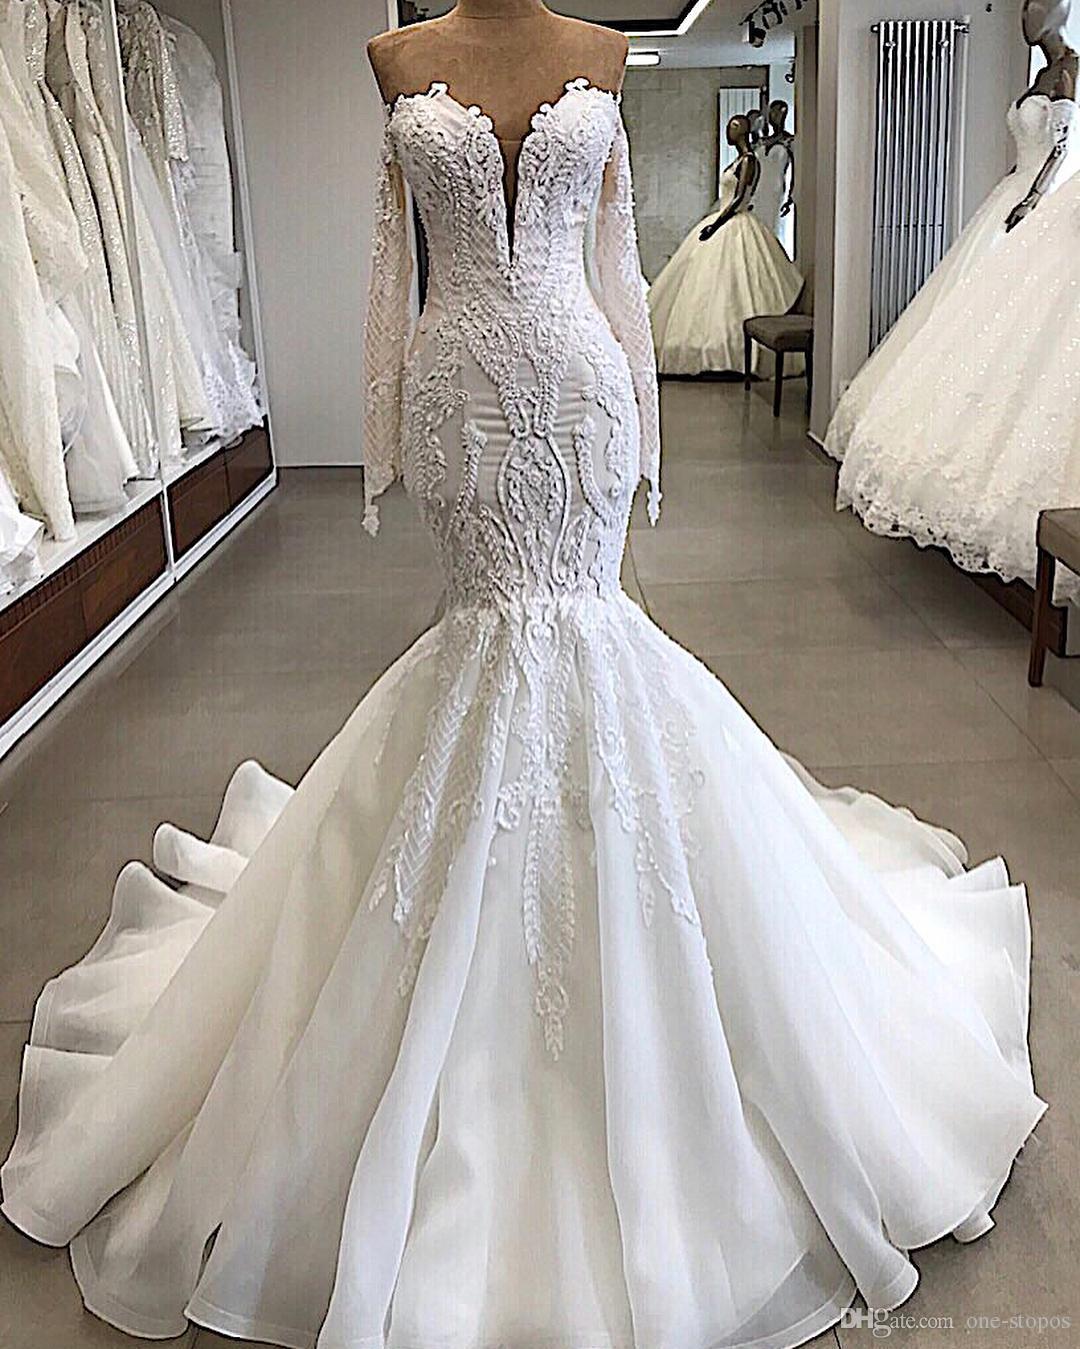 Risque Wedding Dress Photos: 2019 Sexy White Lace Mermaid Wedding Dress Vintage